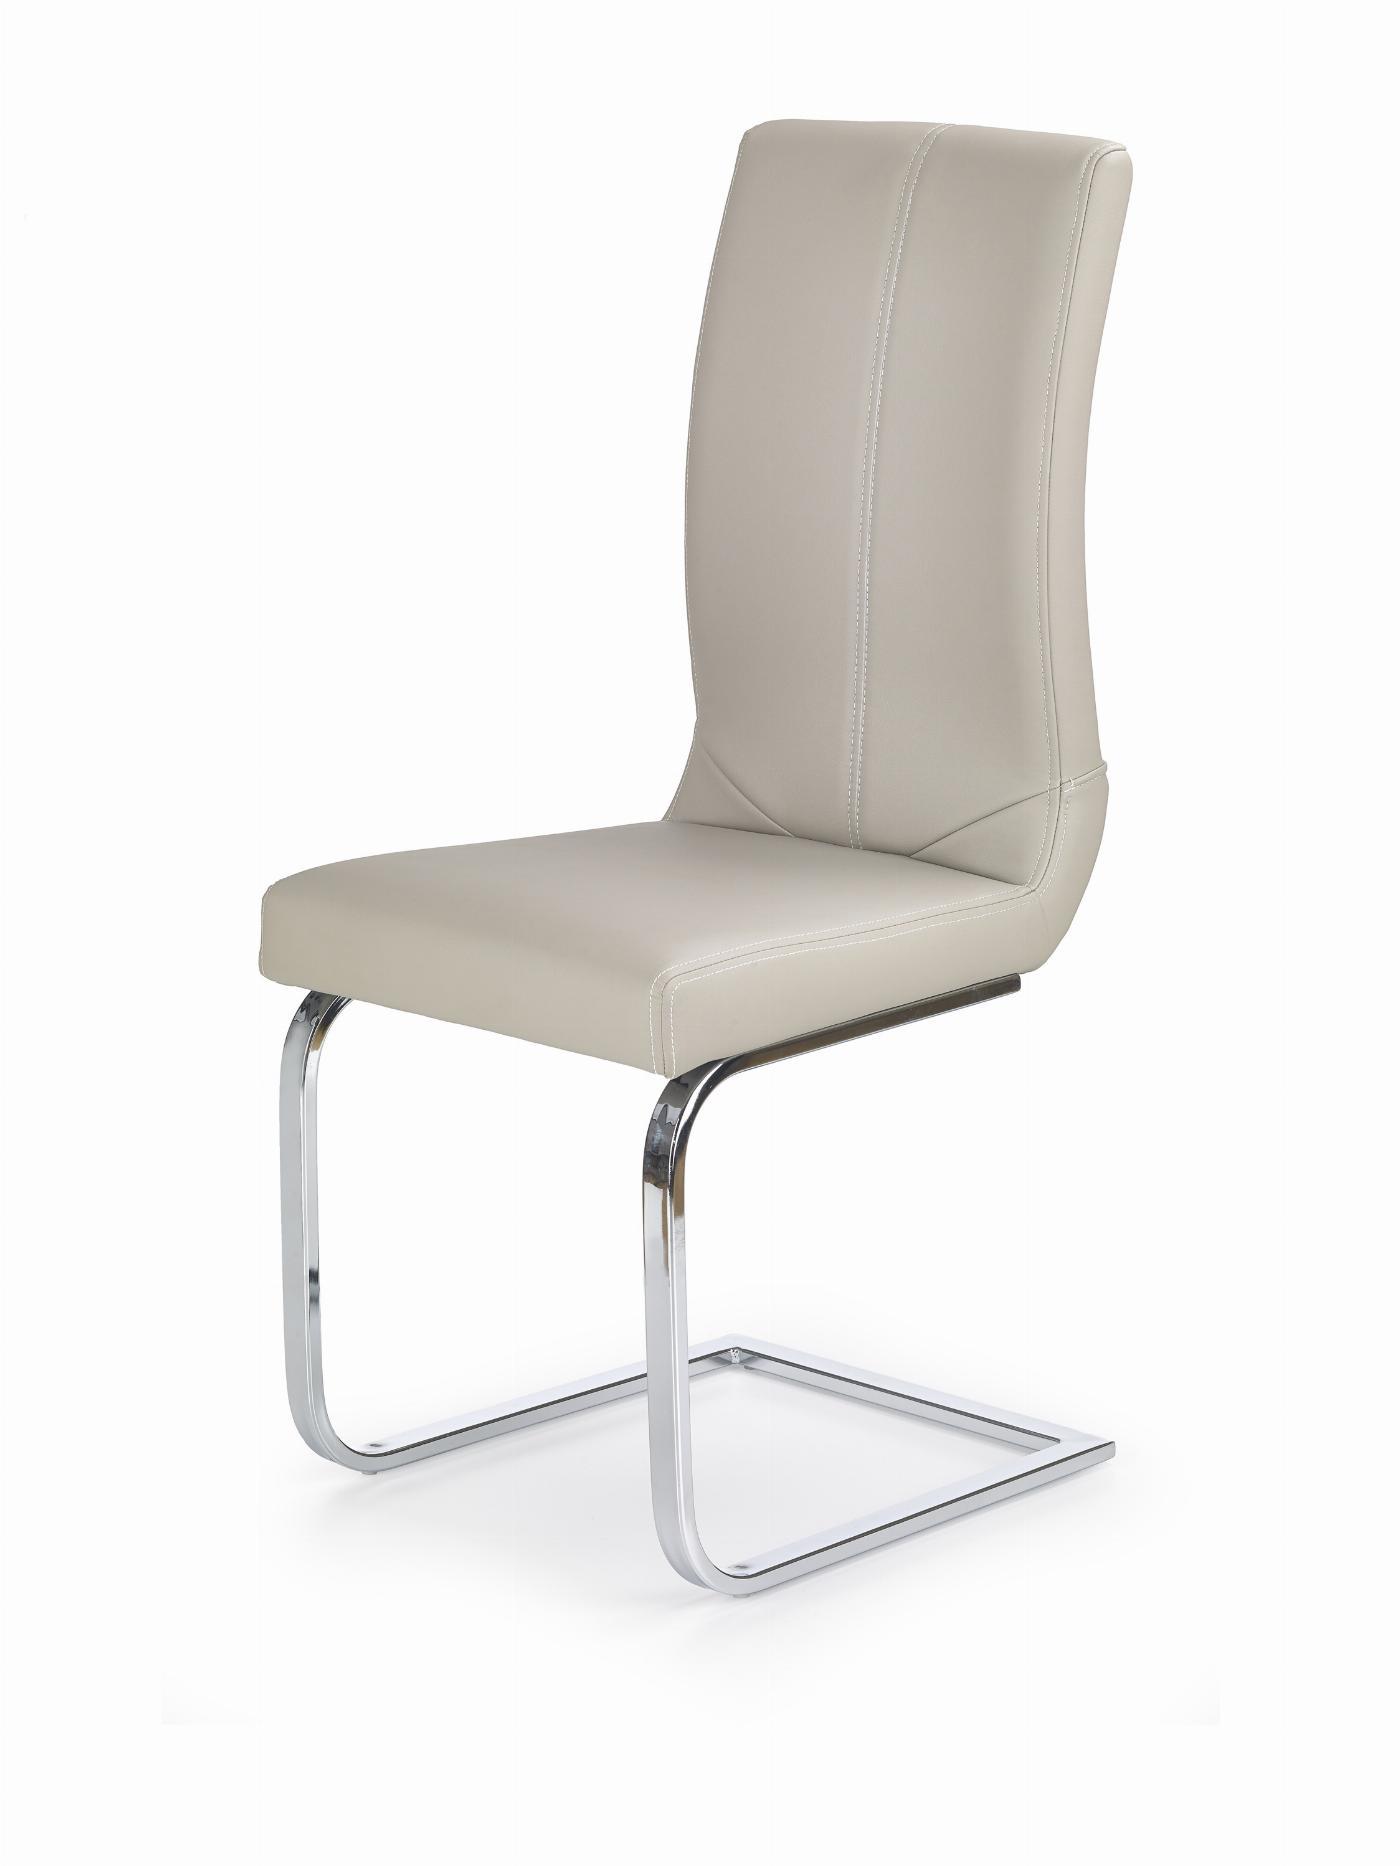 K219 krzesło cappuccino (2p=4szt)